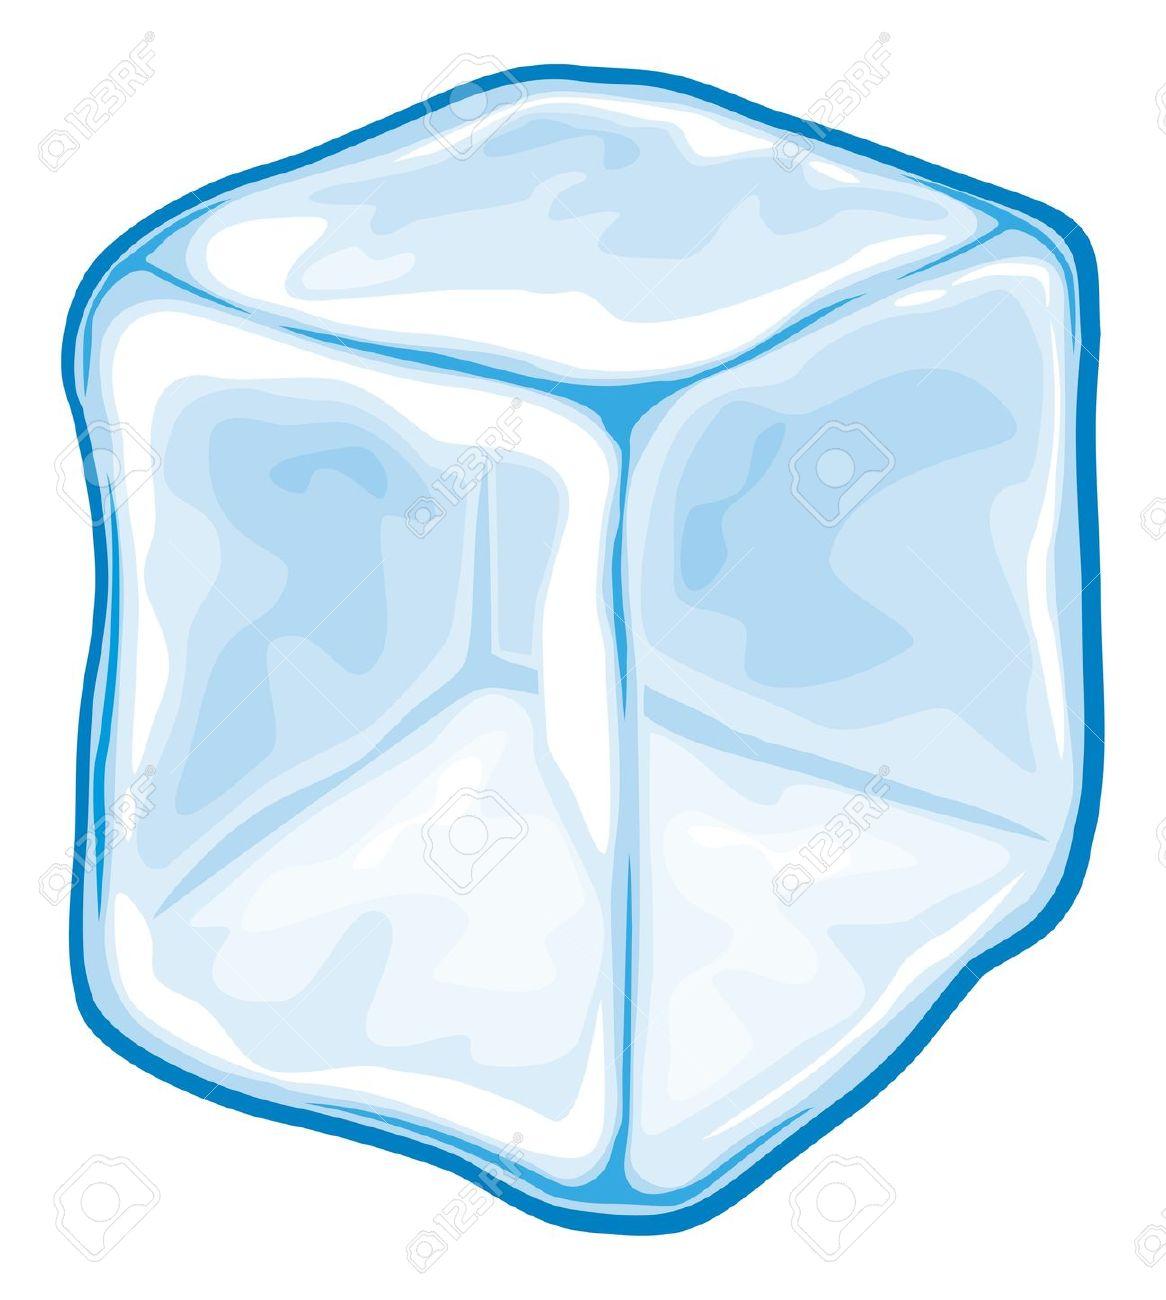 block of ice clipart #20